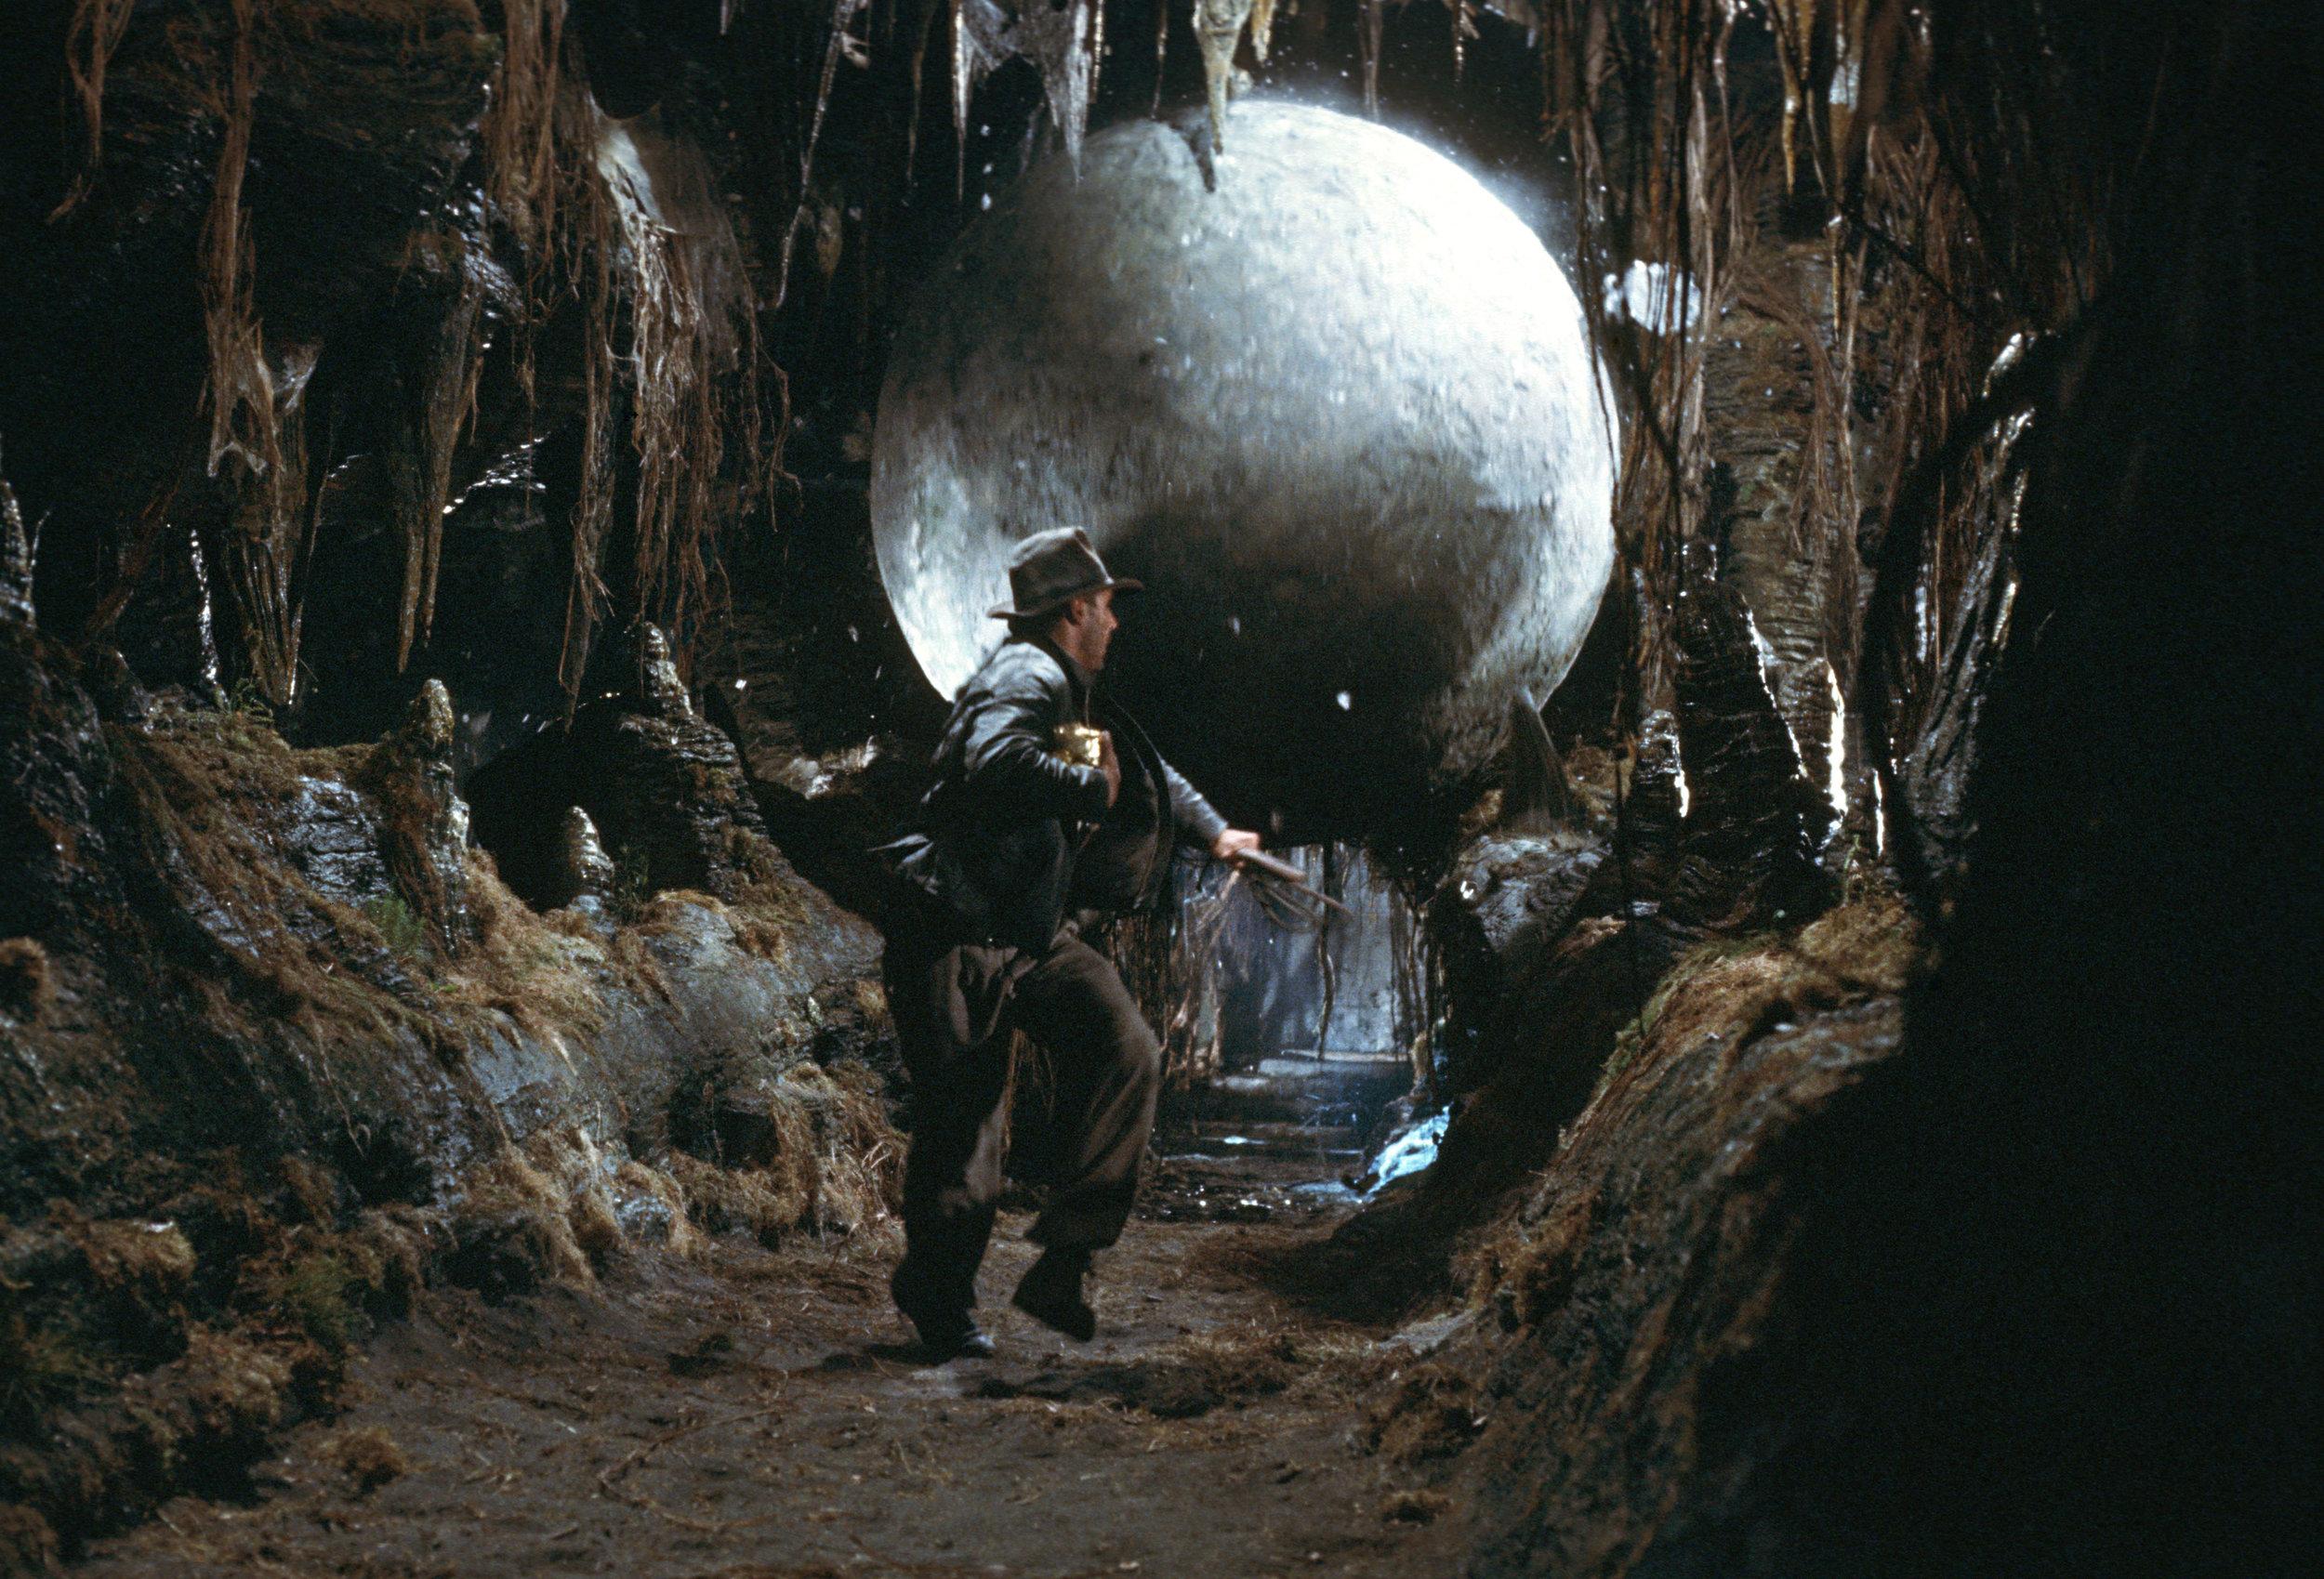 125. Raiders of the Lost Ark (1981)